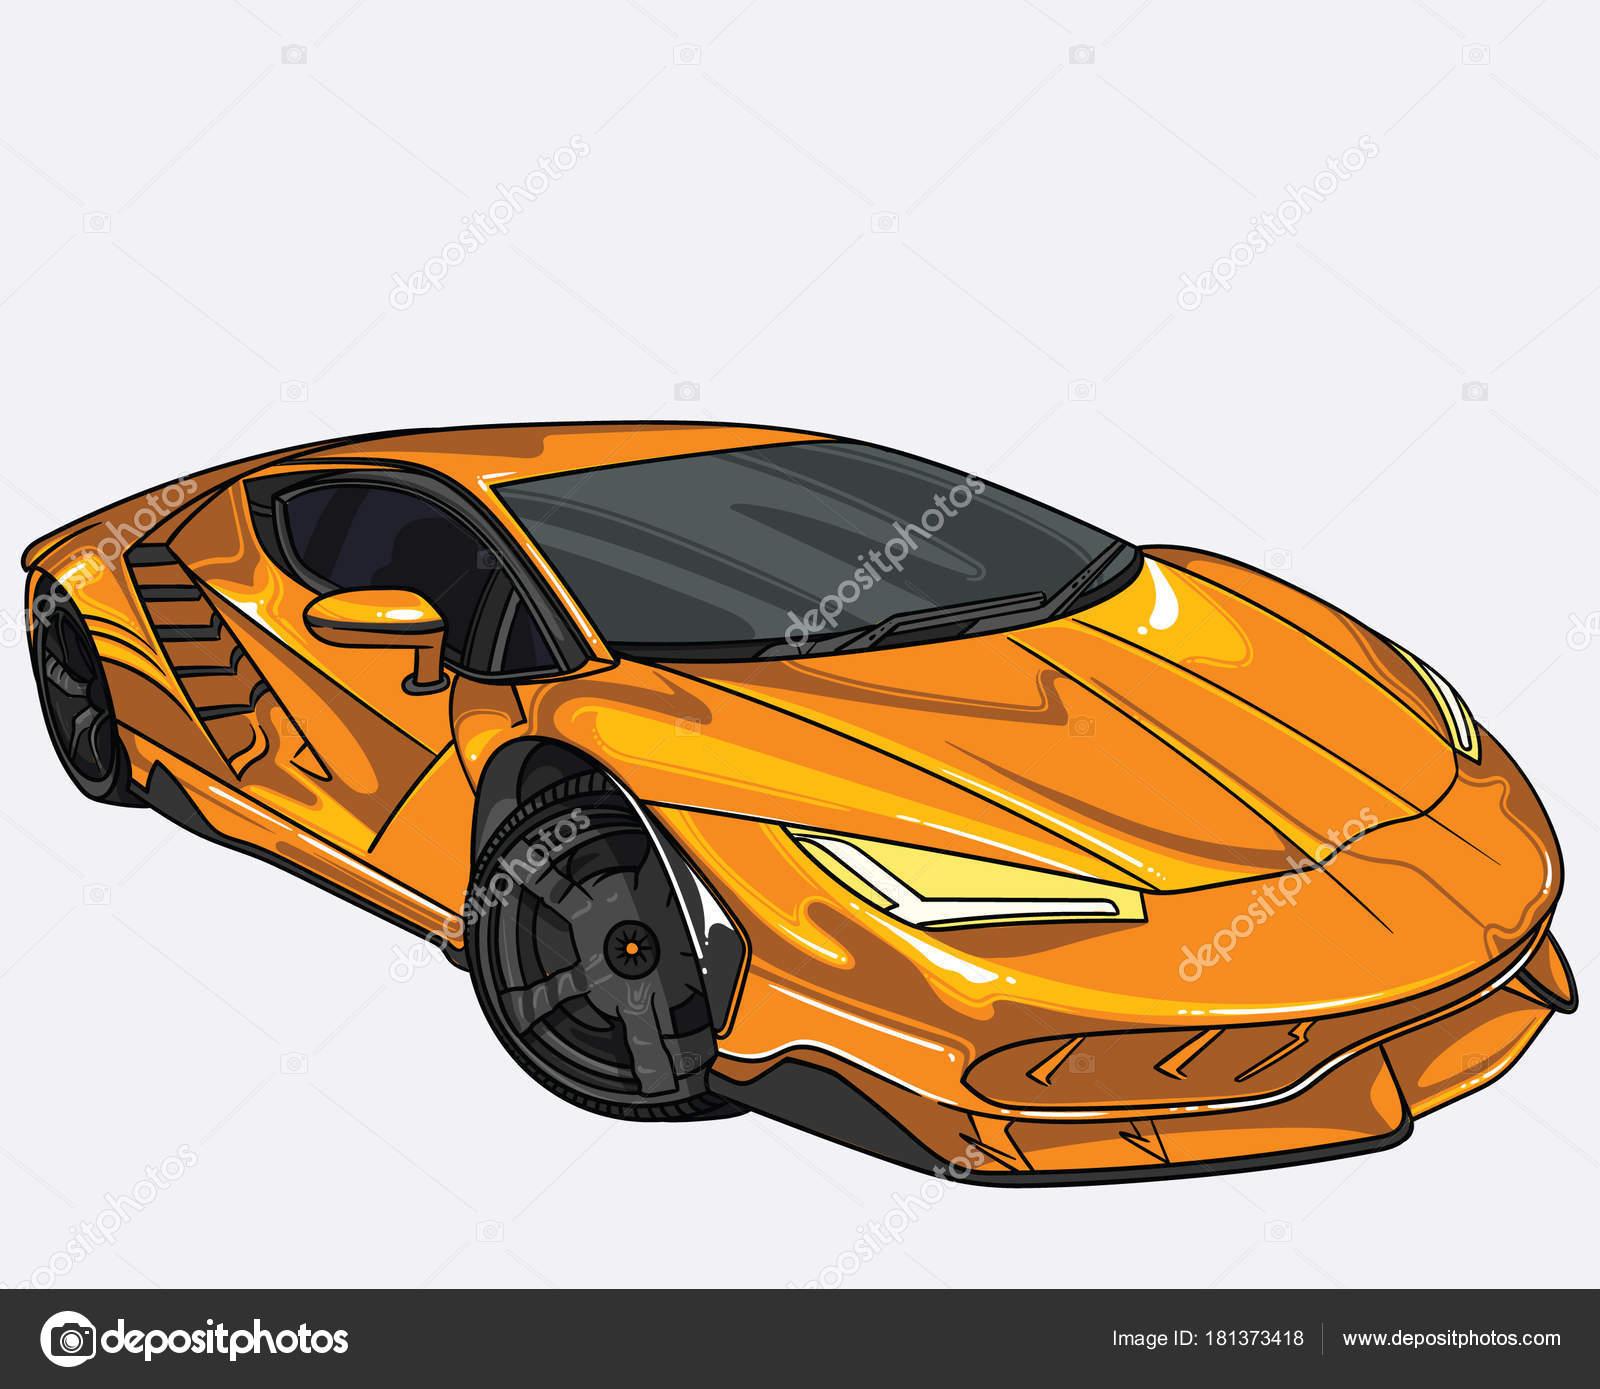 Vector Illustration Of Lamborghini Car Separate On White Background